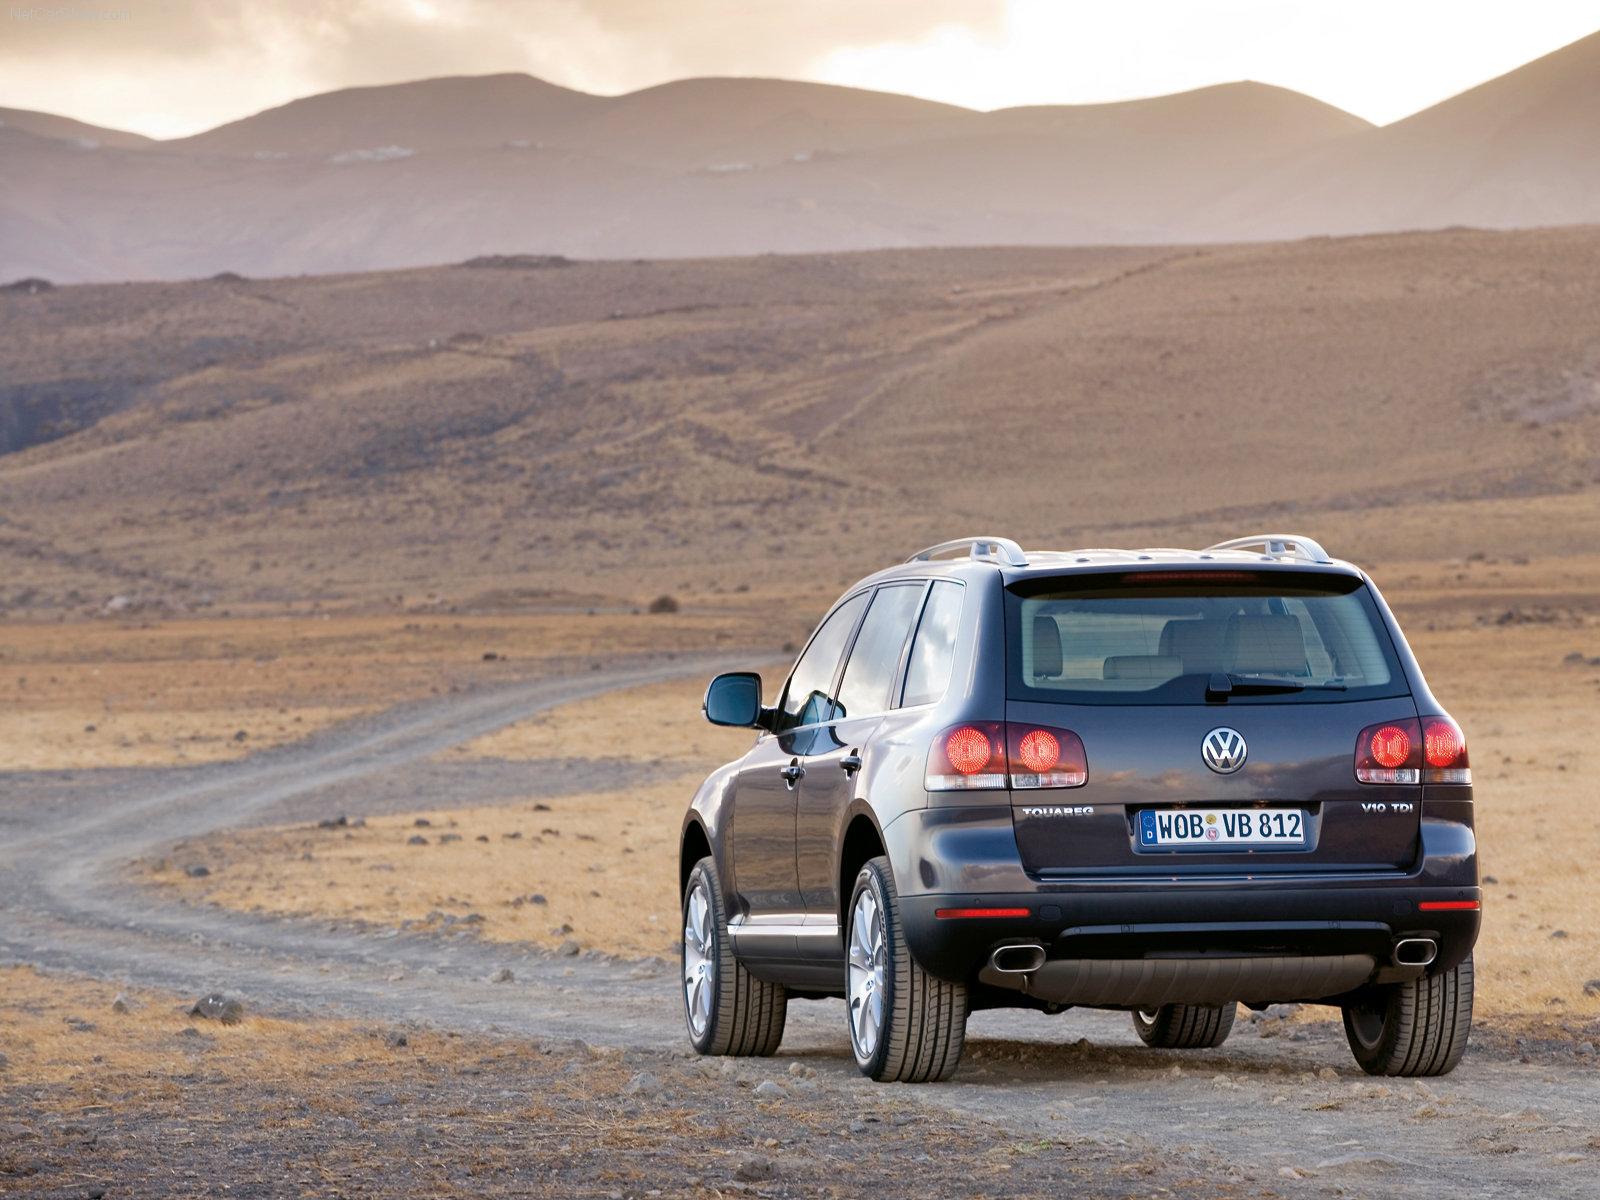 https://w04.ru/foto/Volkswagen-Touareg_2007_1600x1200_wallpaper_17.jpg